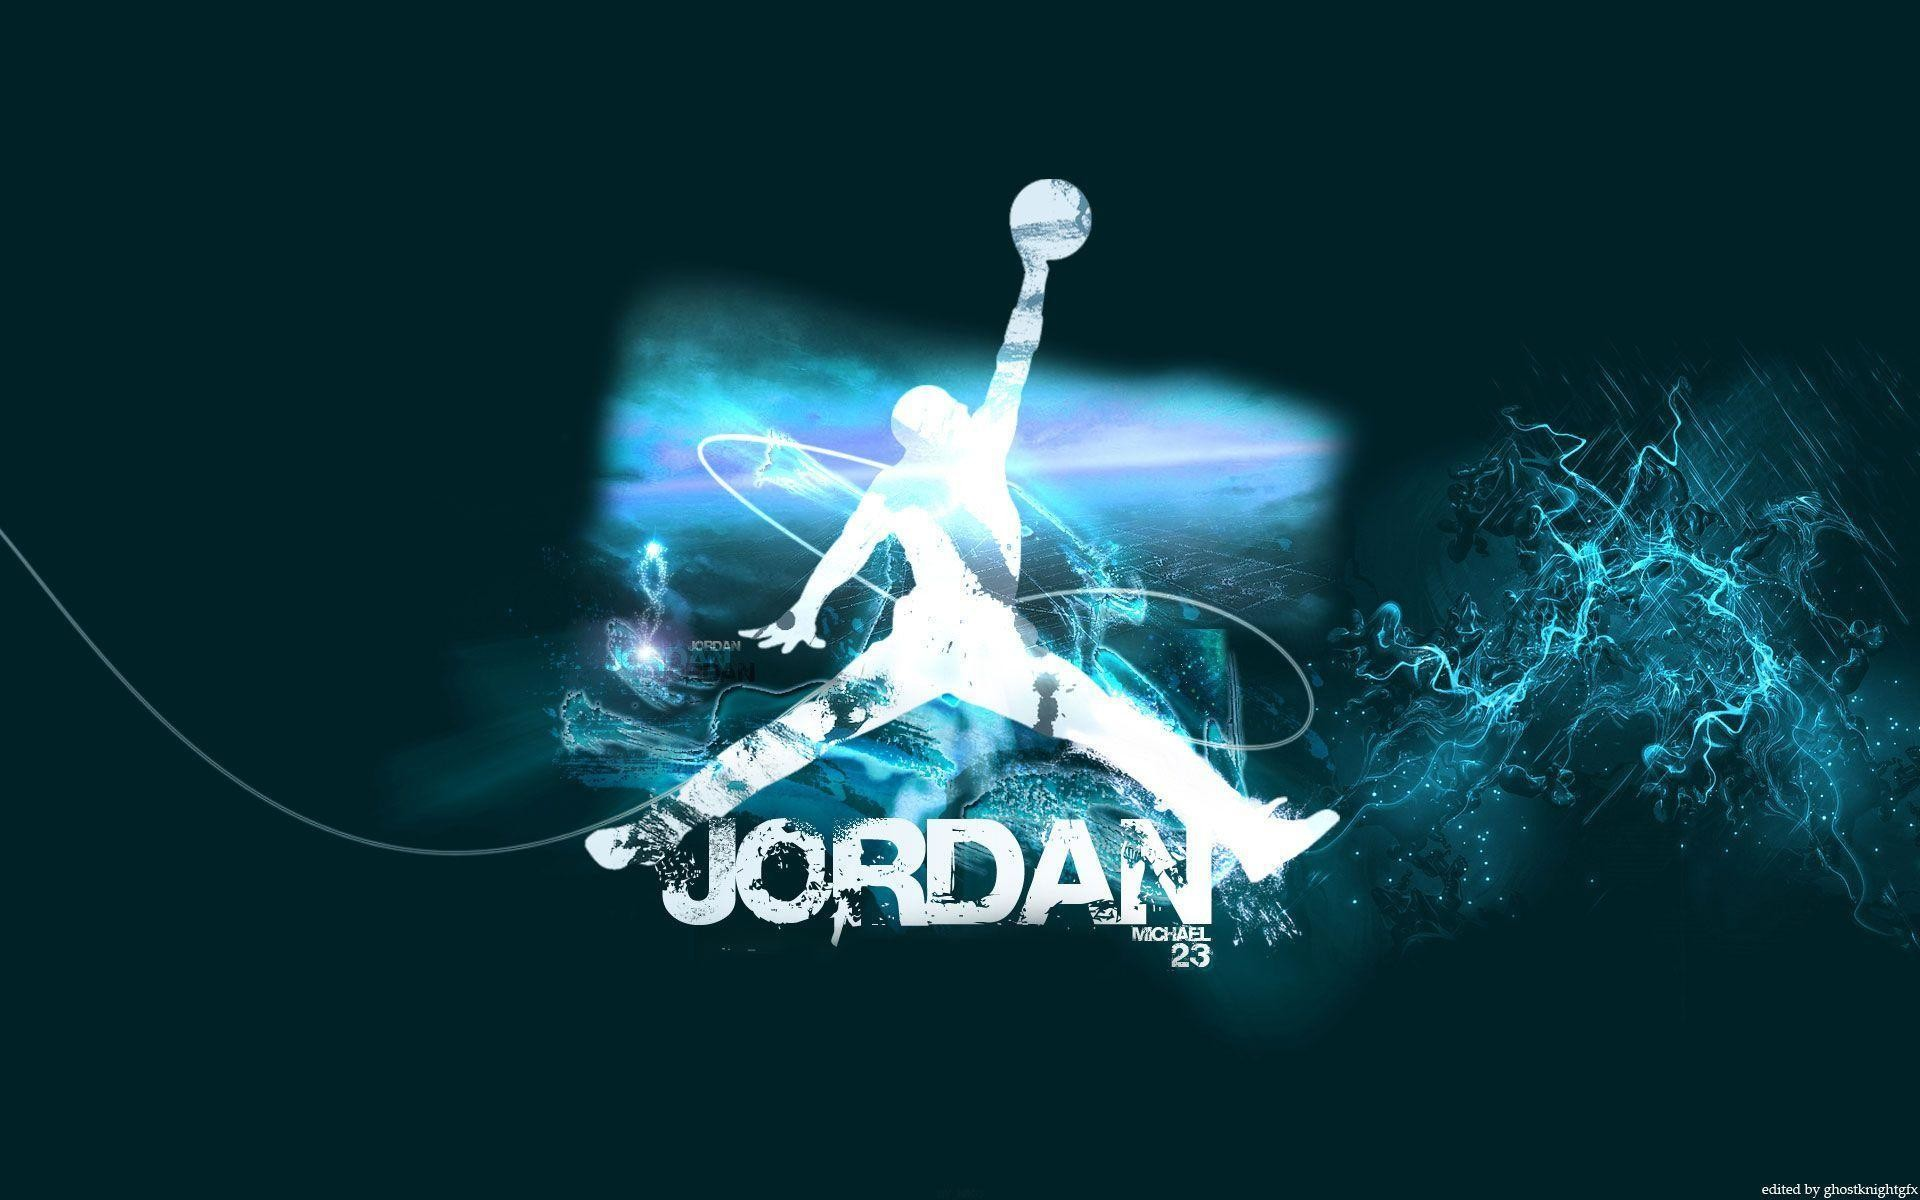 Jordan Logo Wallpapers – Full HD wallpaper search